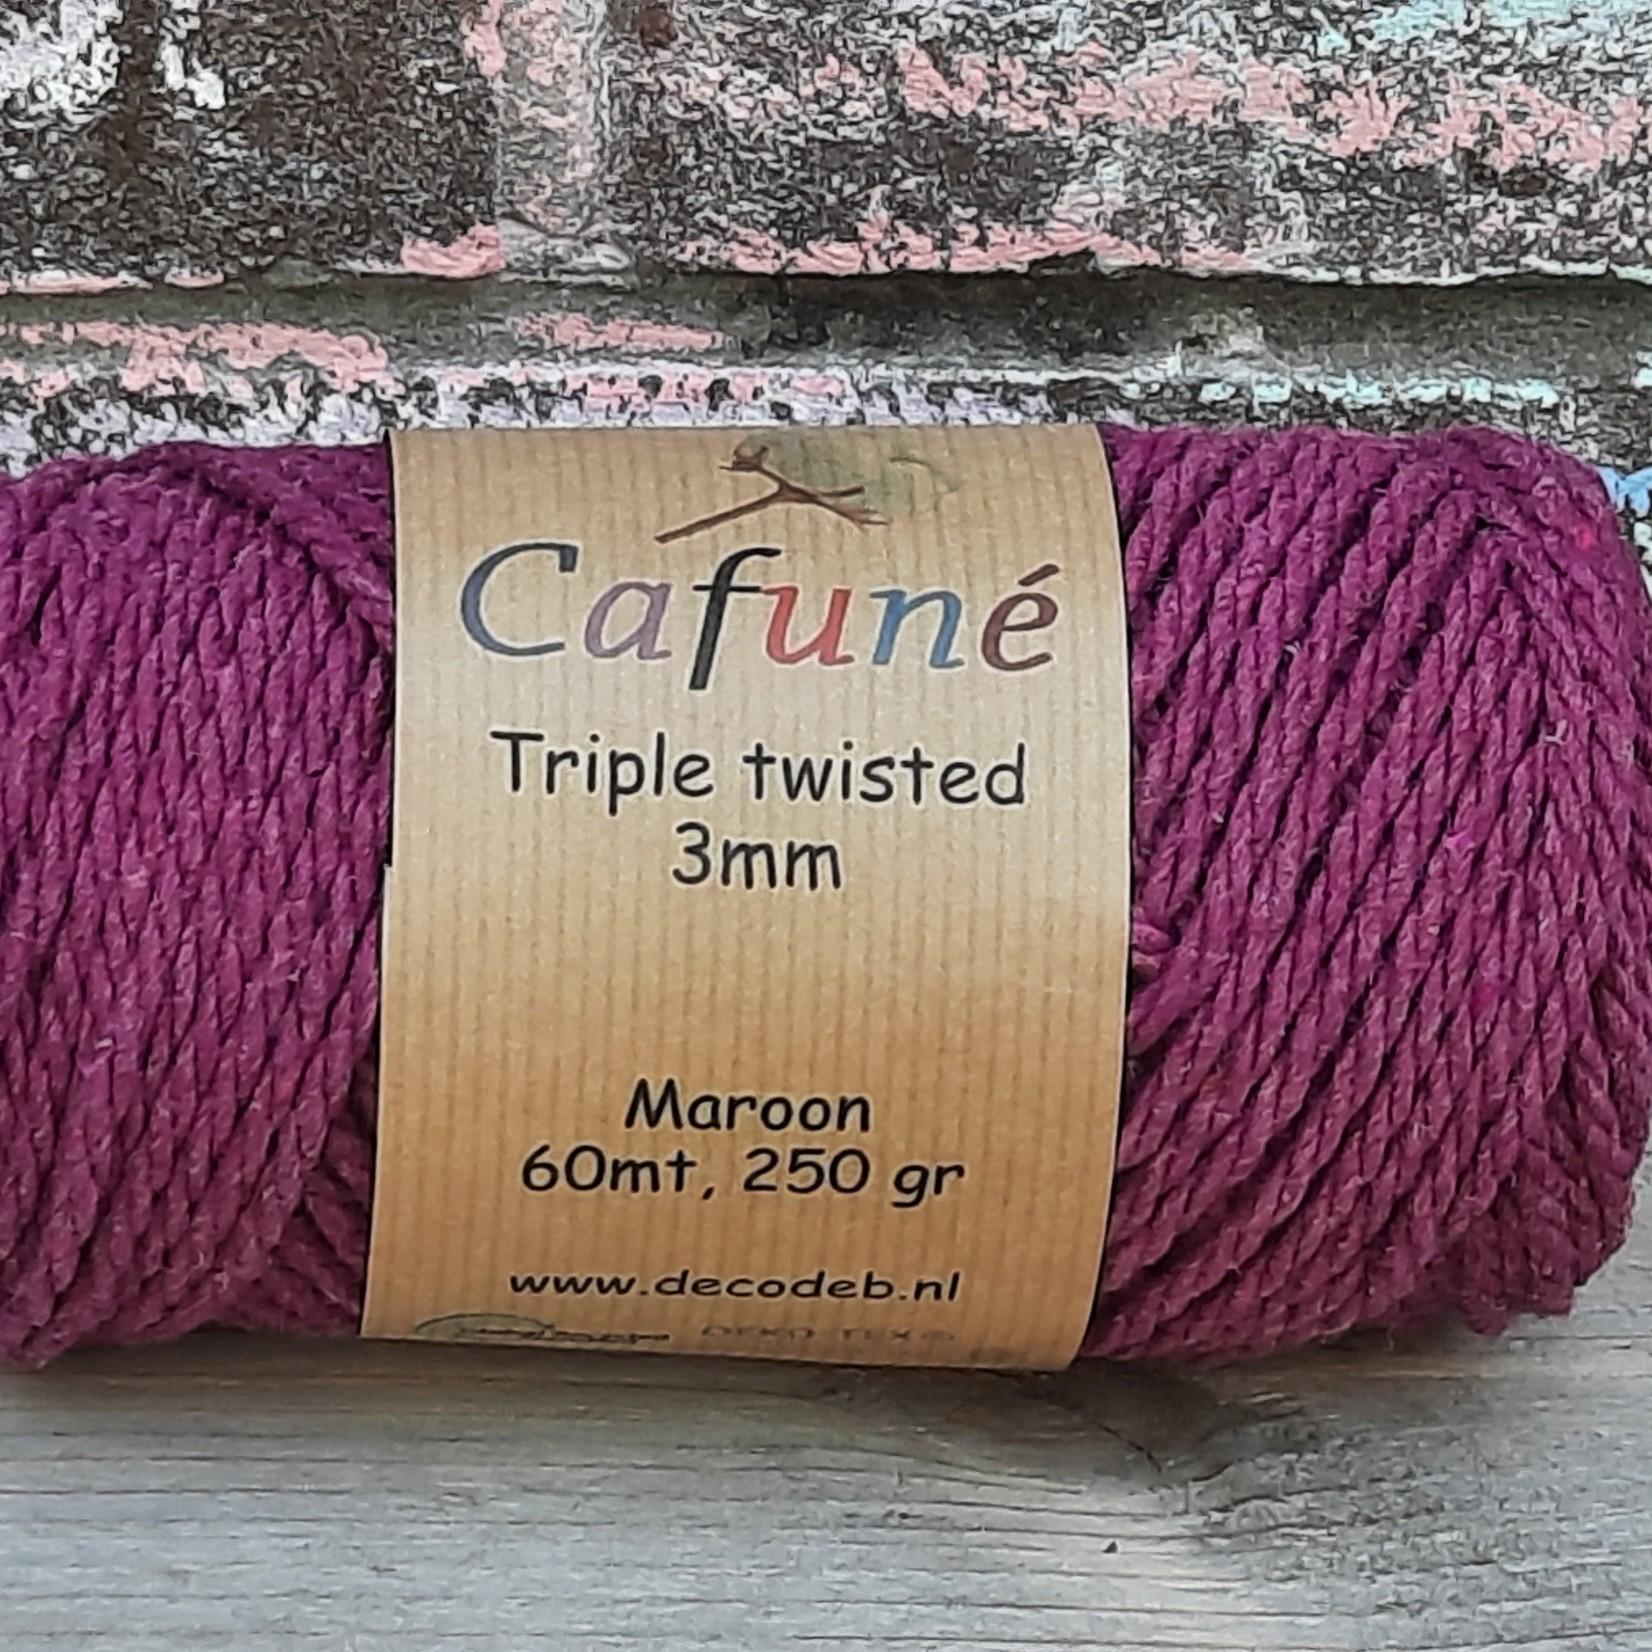 3mm Macrame touw Damson/Maroon Triple twisted uitkambaar